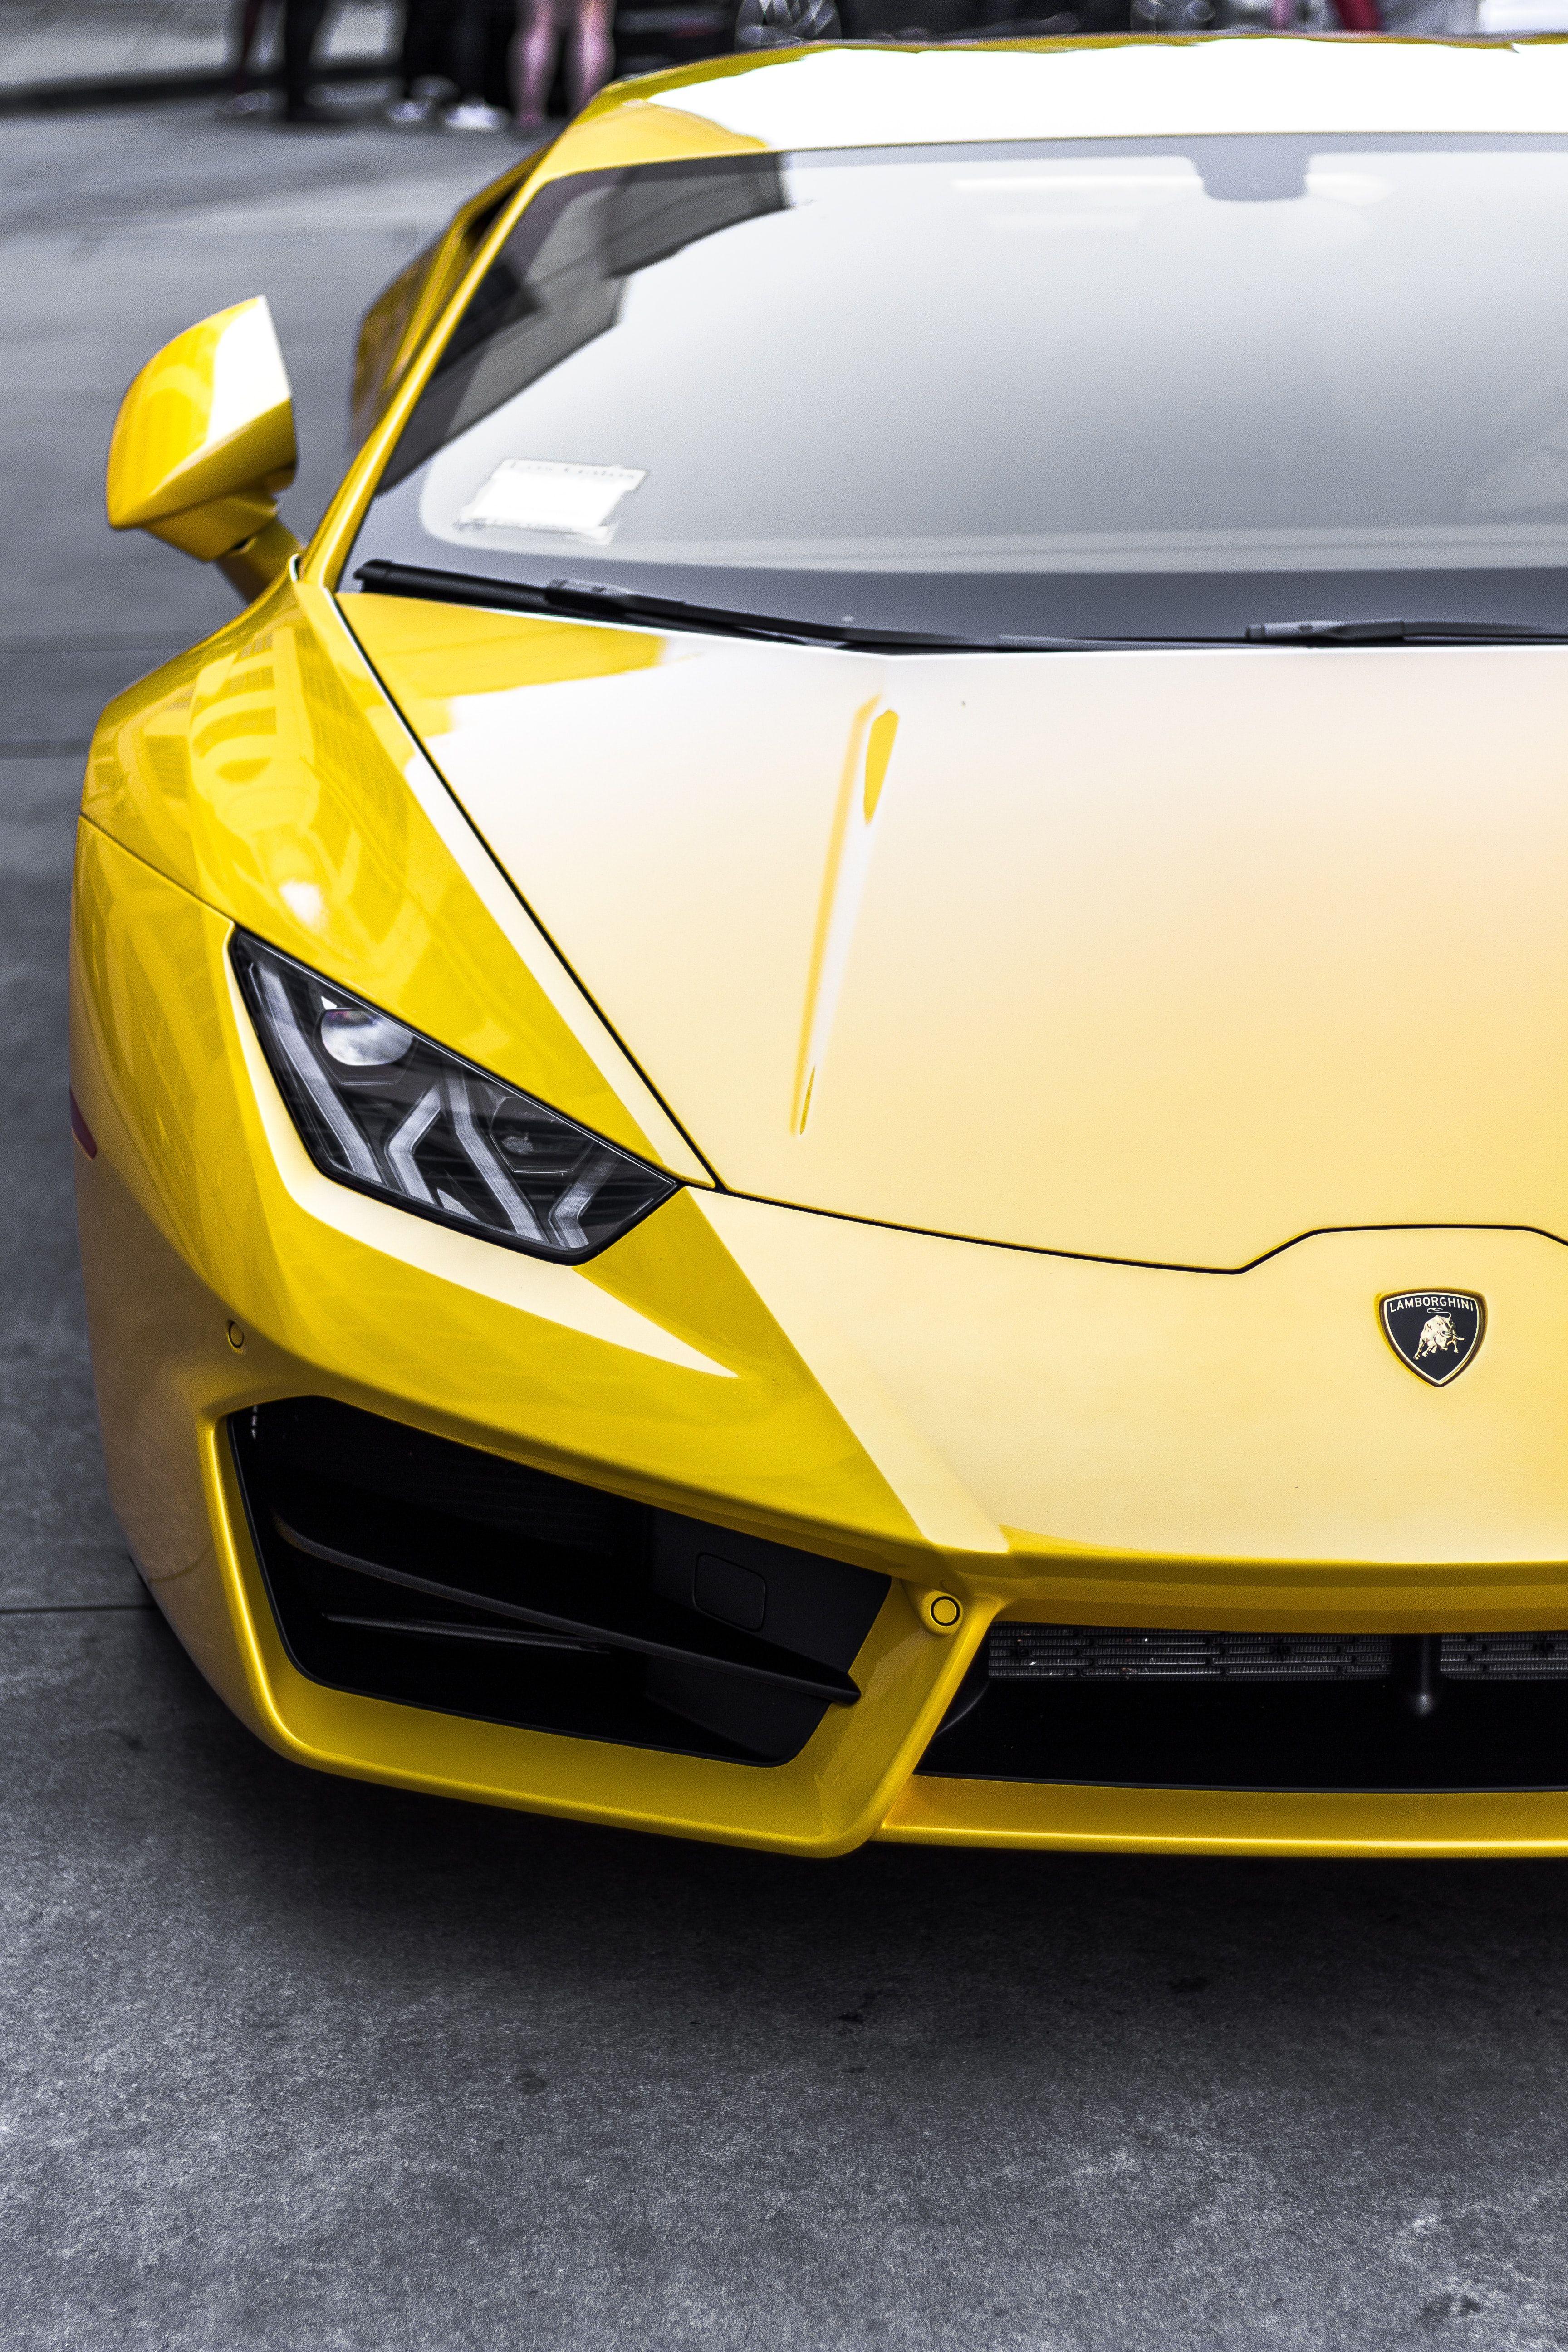 Gold Lamborghini Iphone Wallpaper   ipcwallpapers